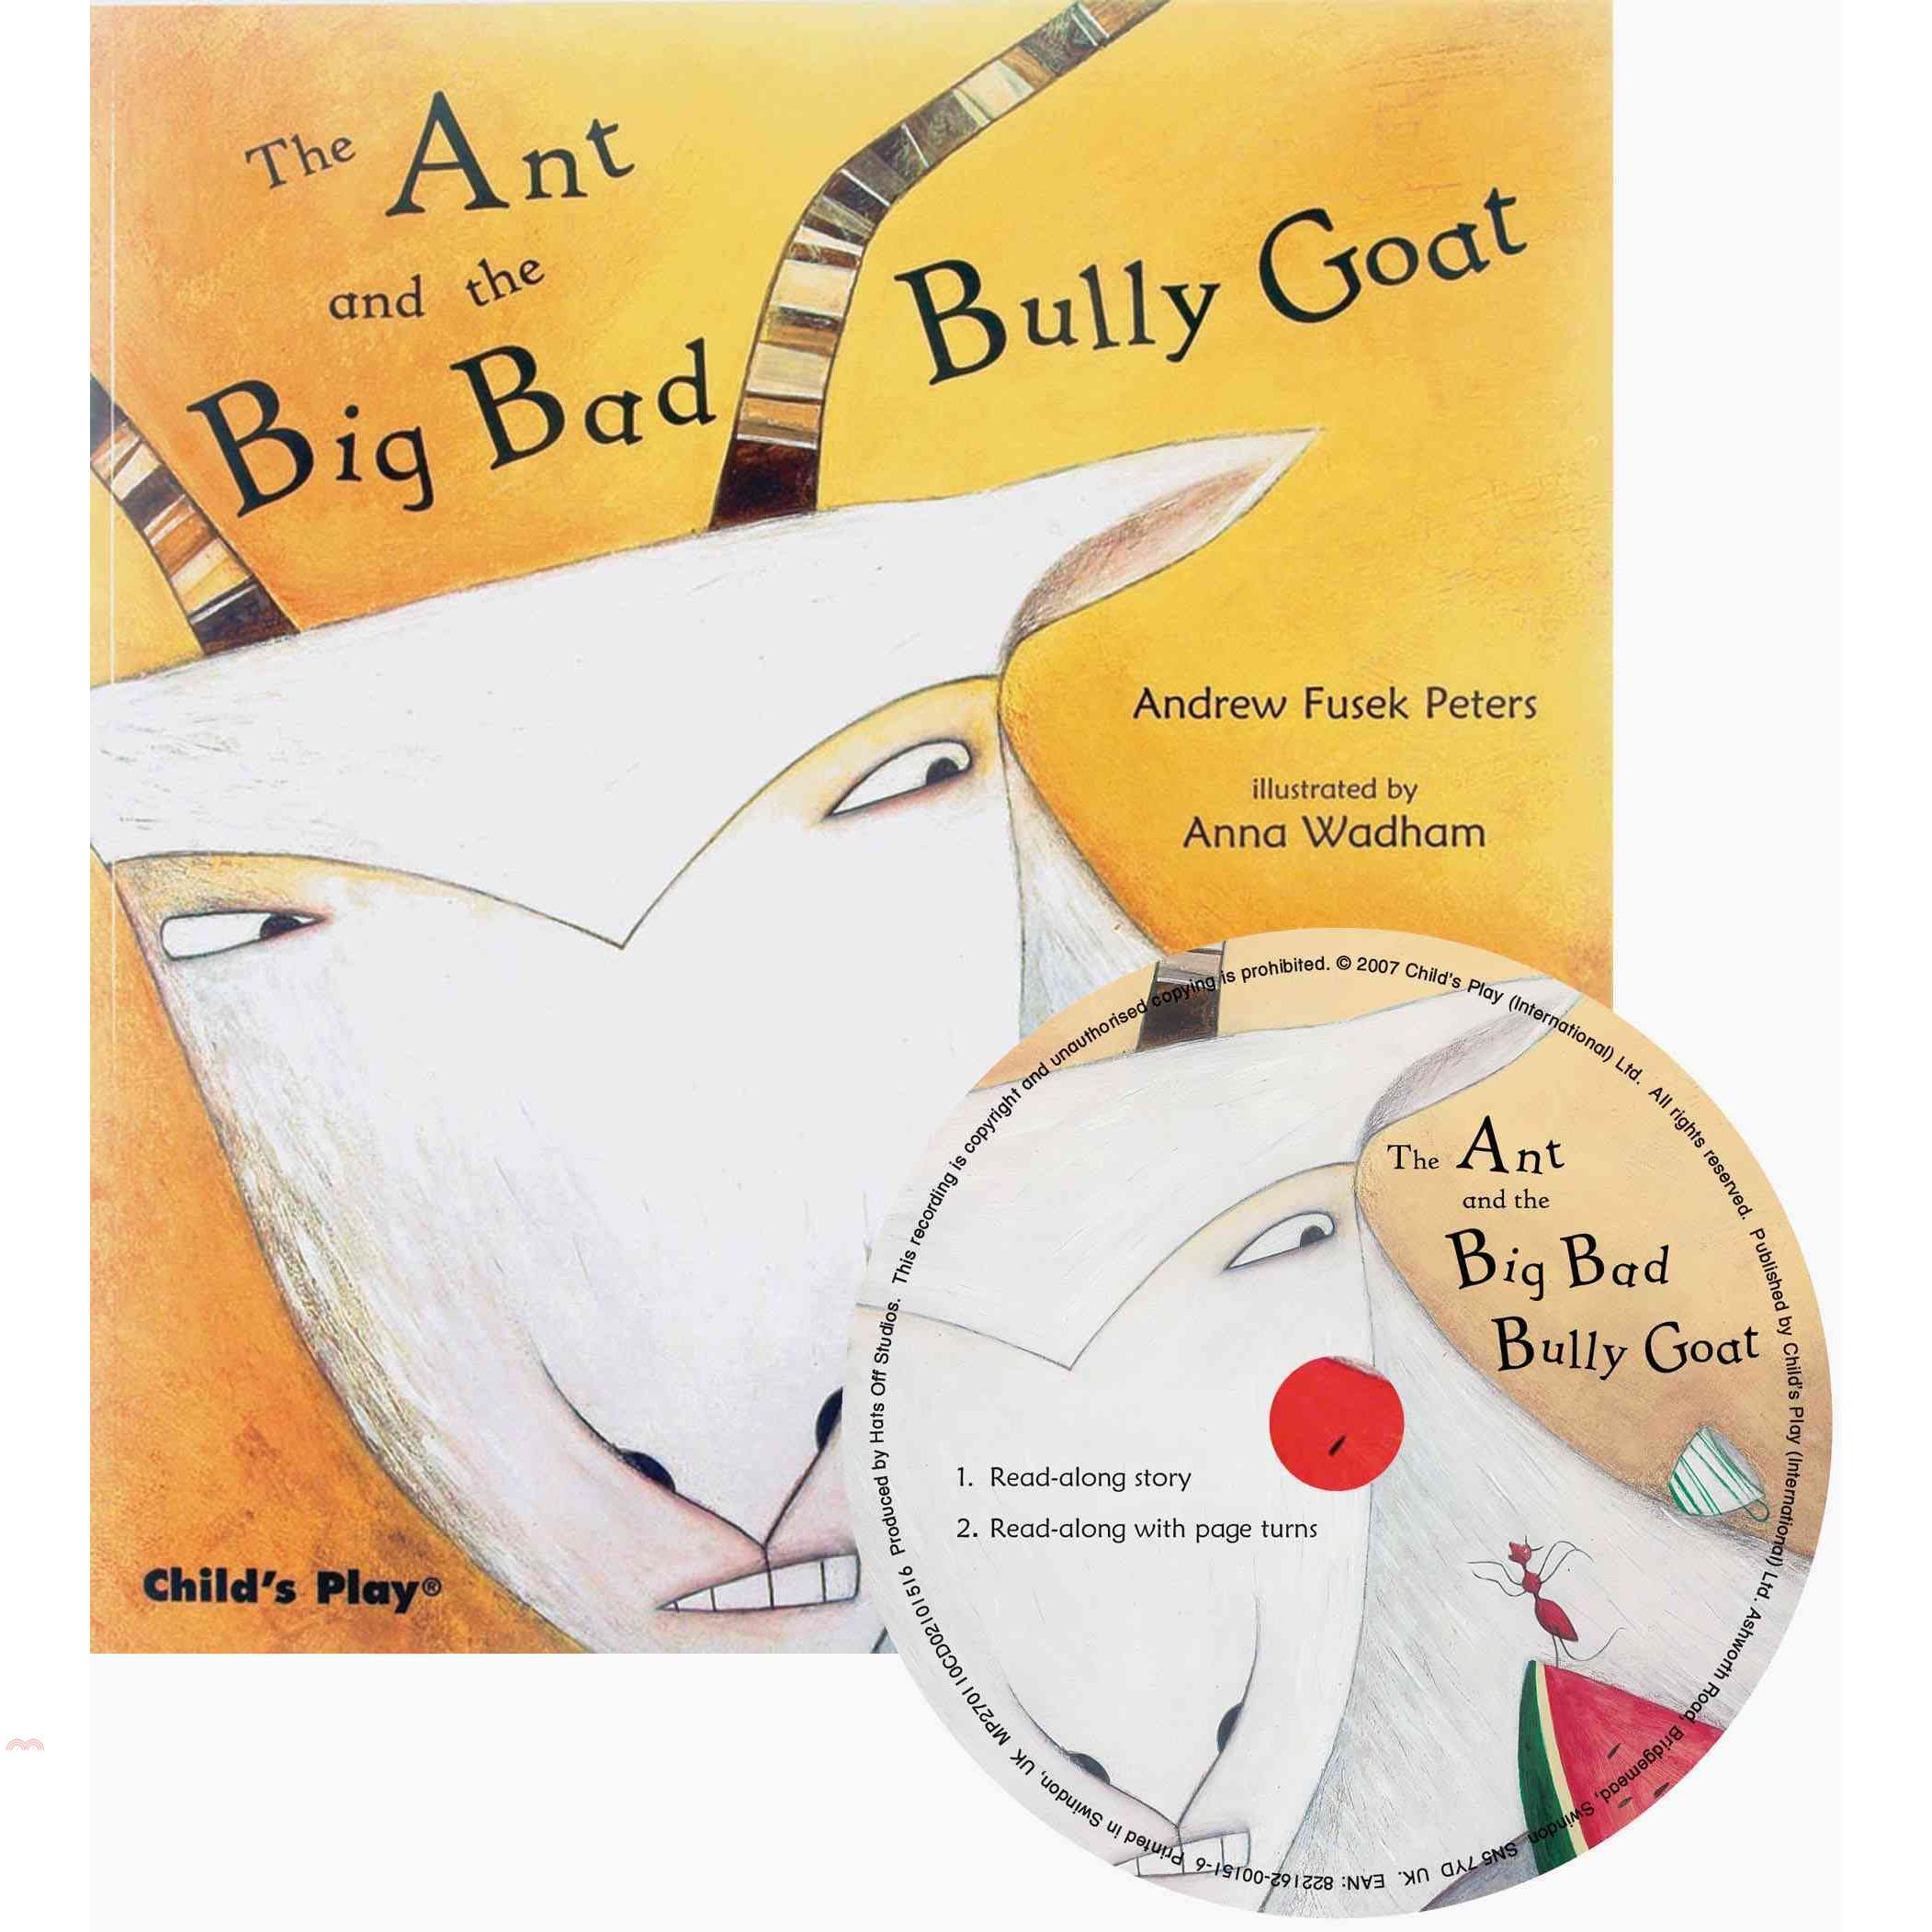 The Ant and the Big Bad Bully Goat (1平裝+1CD)【三民網路書店】[75折]